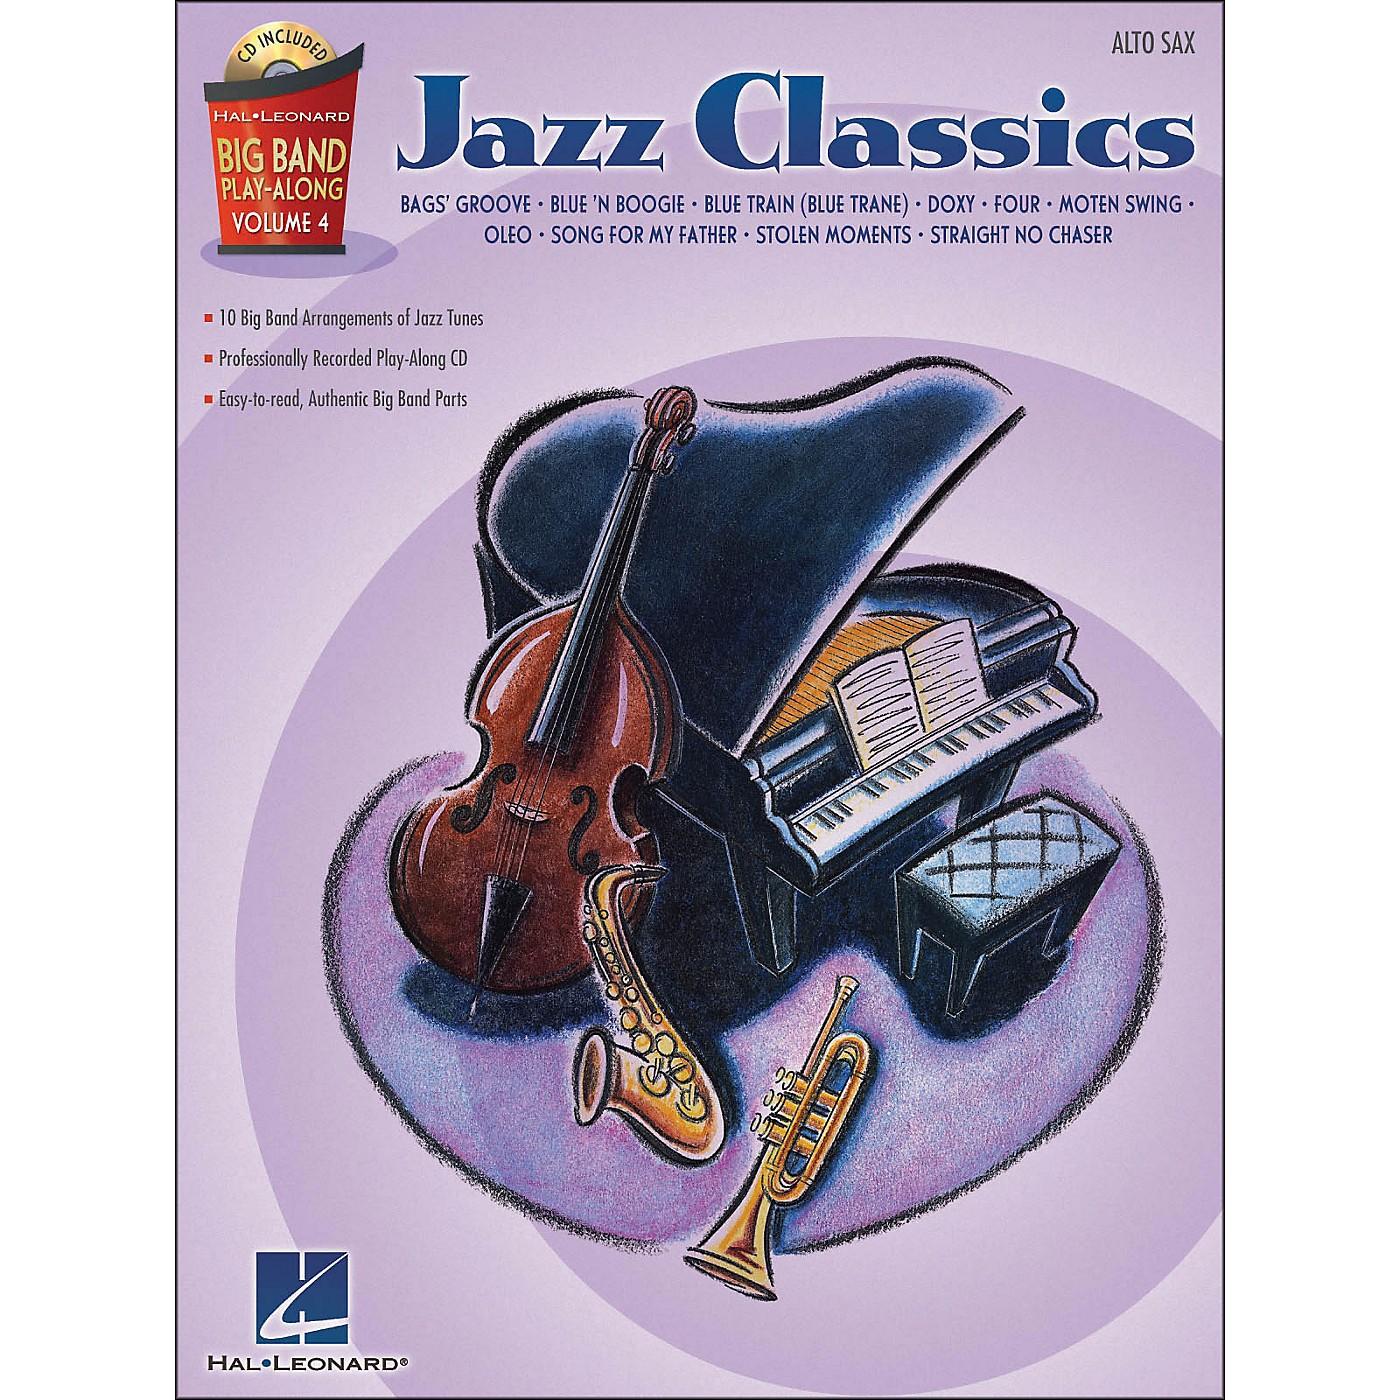 Hal Leonard Jazz Classics - Big Band Play-Along Vol. 4 Alto Sax thumbnail